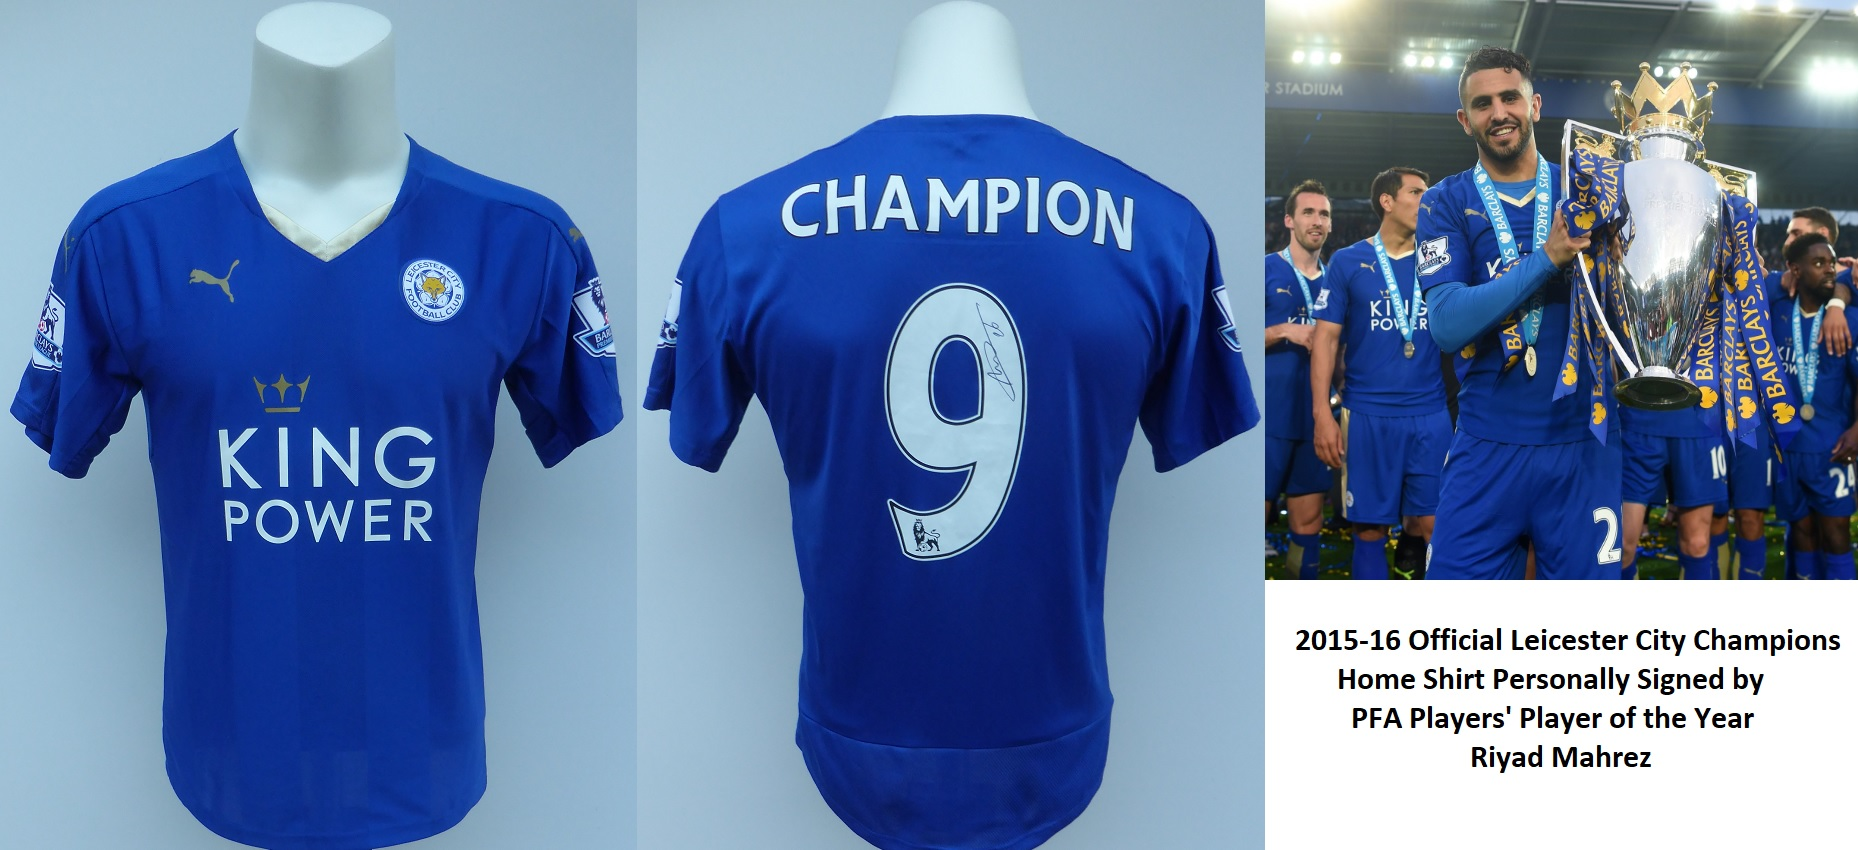 timeless design d68b2 8246d 2015-16 Leicester City Champions Home Shirt Signed by Riyad Mahrez COA  (15286)